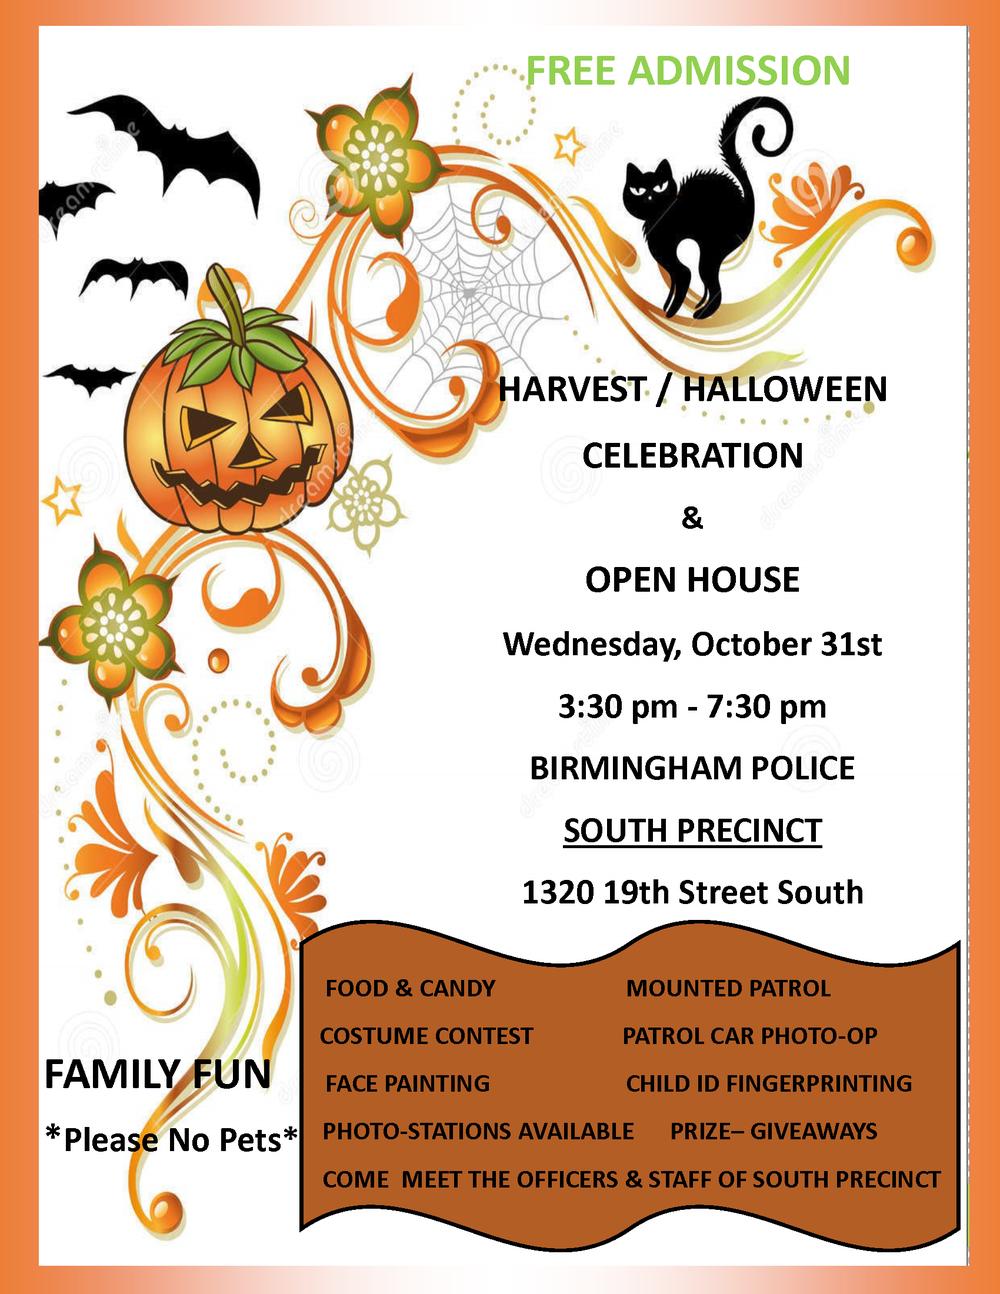 2018 South Precinct Halloween Flyer & Open House.png